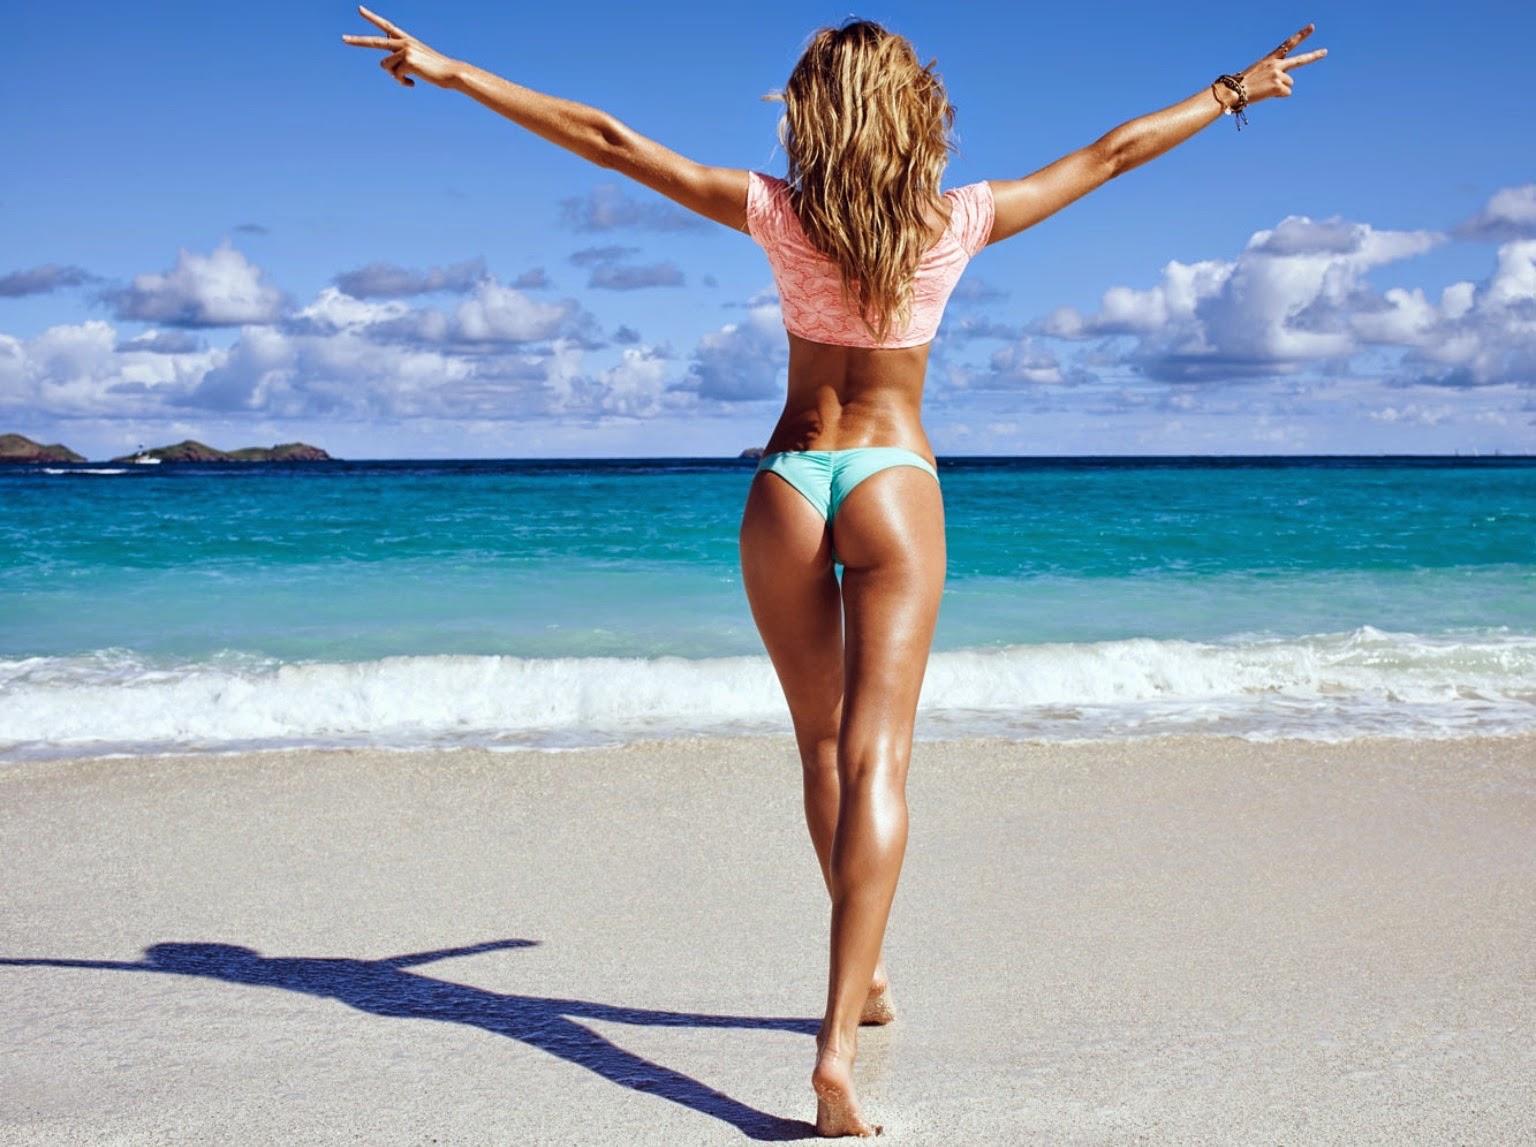 Candice-Swanepoel-Paola-Murray-Swimwear-4.jpg